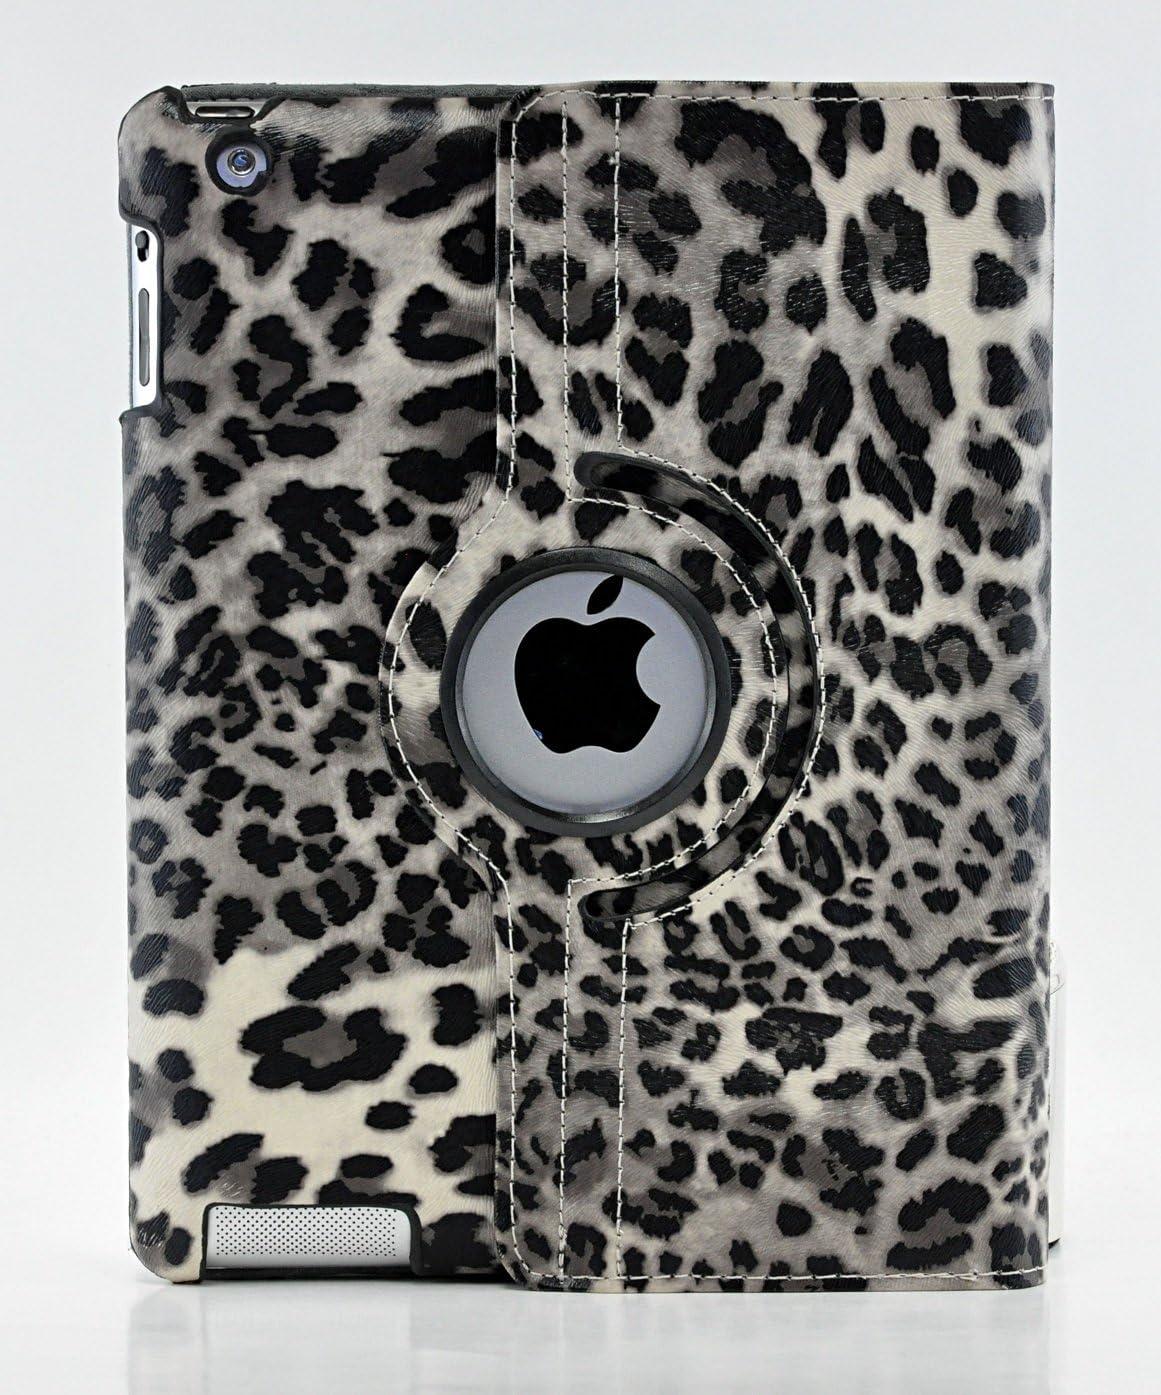 LiViTech(TM Leopard Design Series 360 Degree Rotating PU Leather Case Cover for Apple iPad (iPad Mini 1 2 3, Gray)